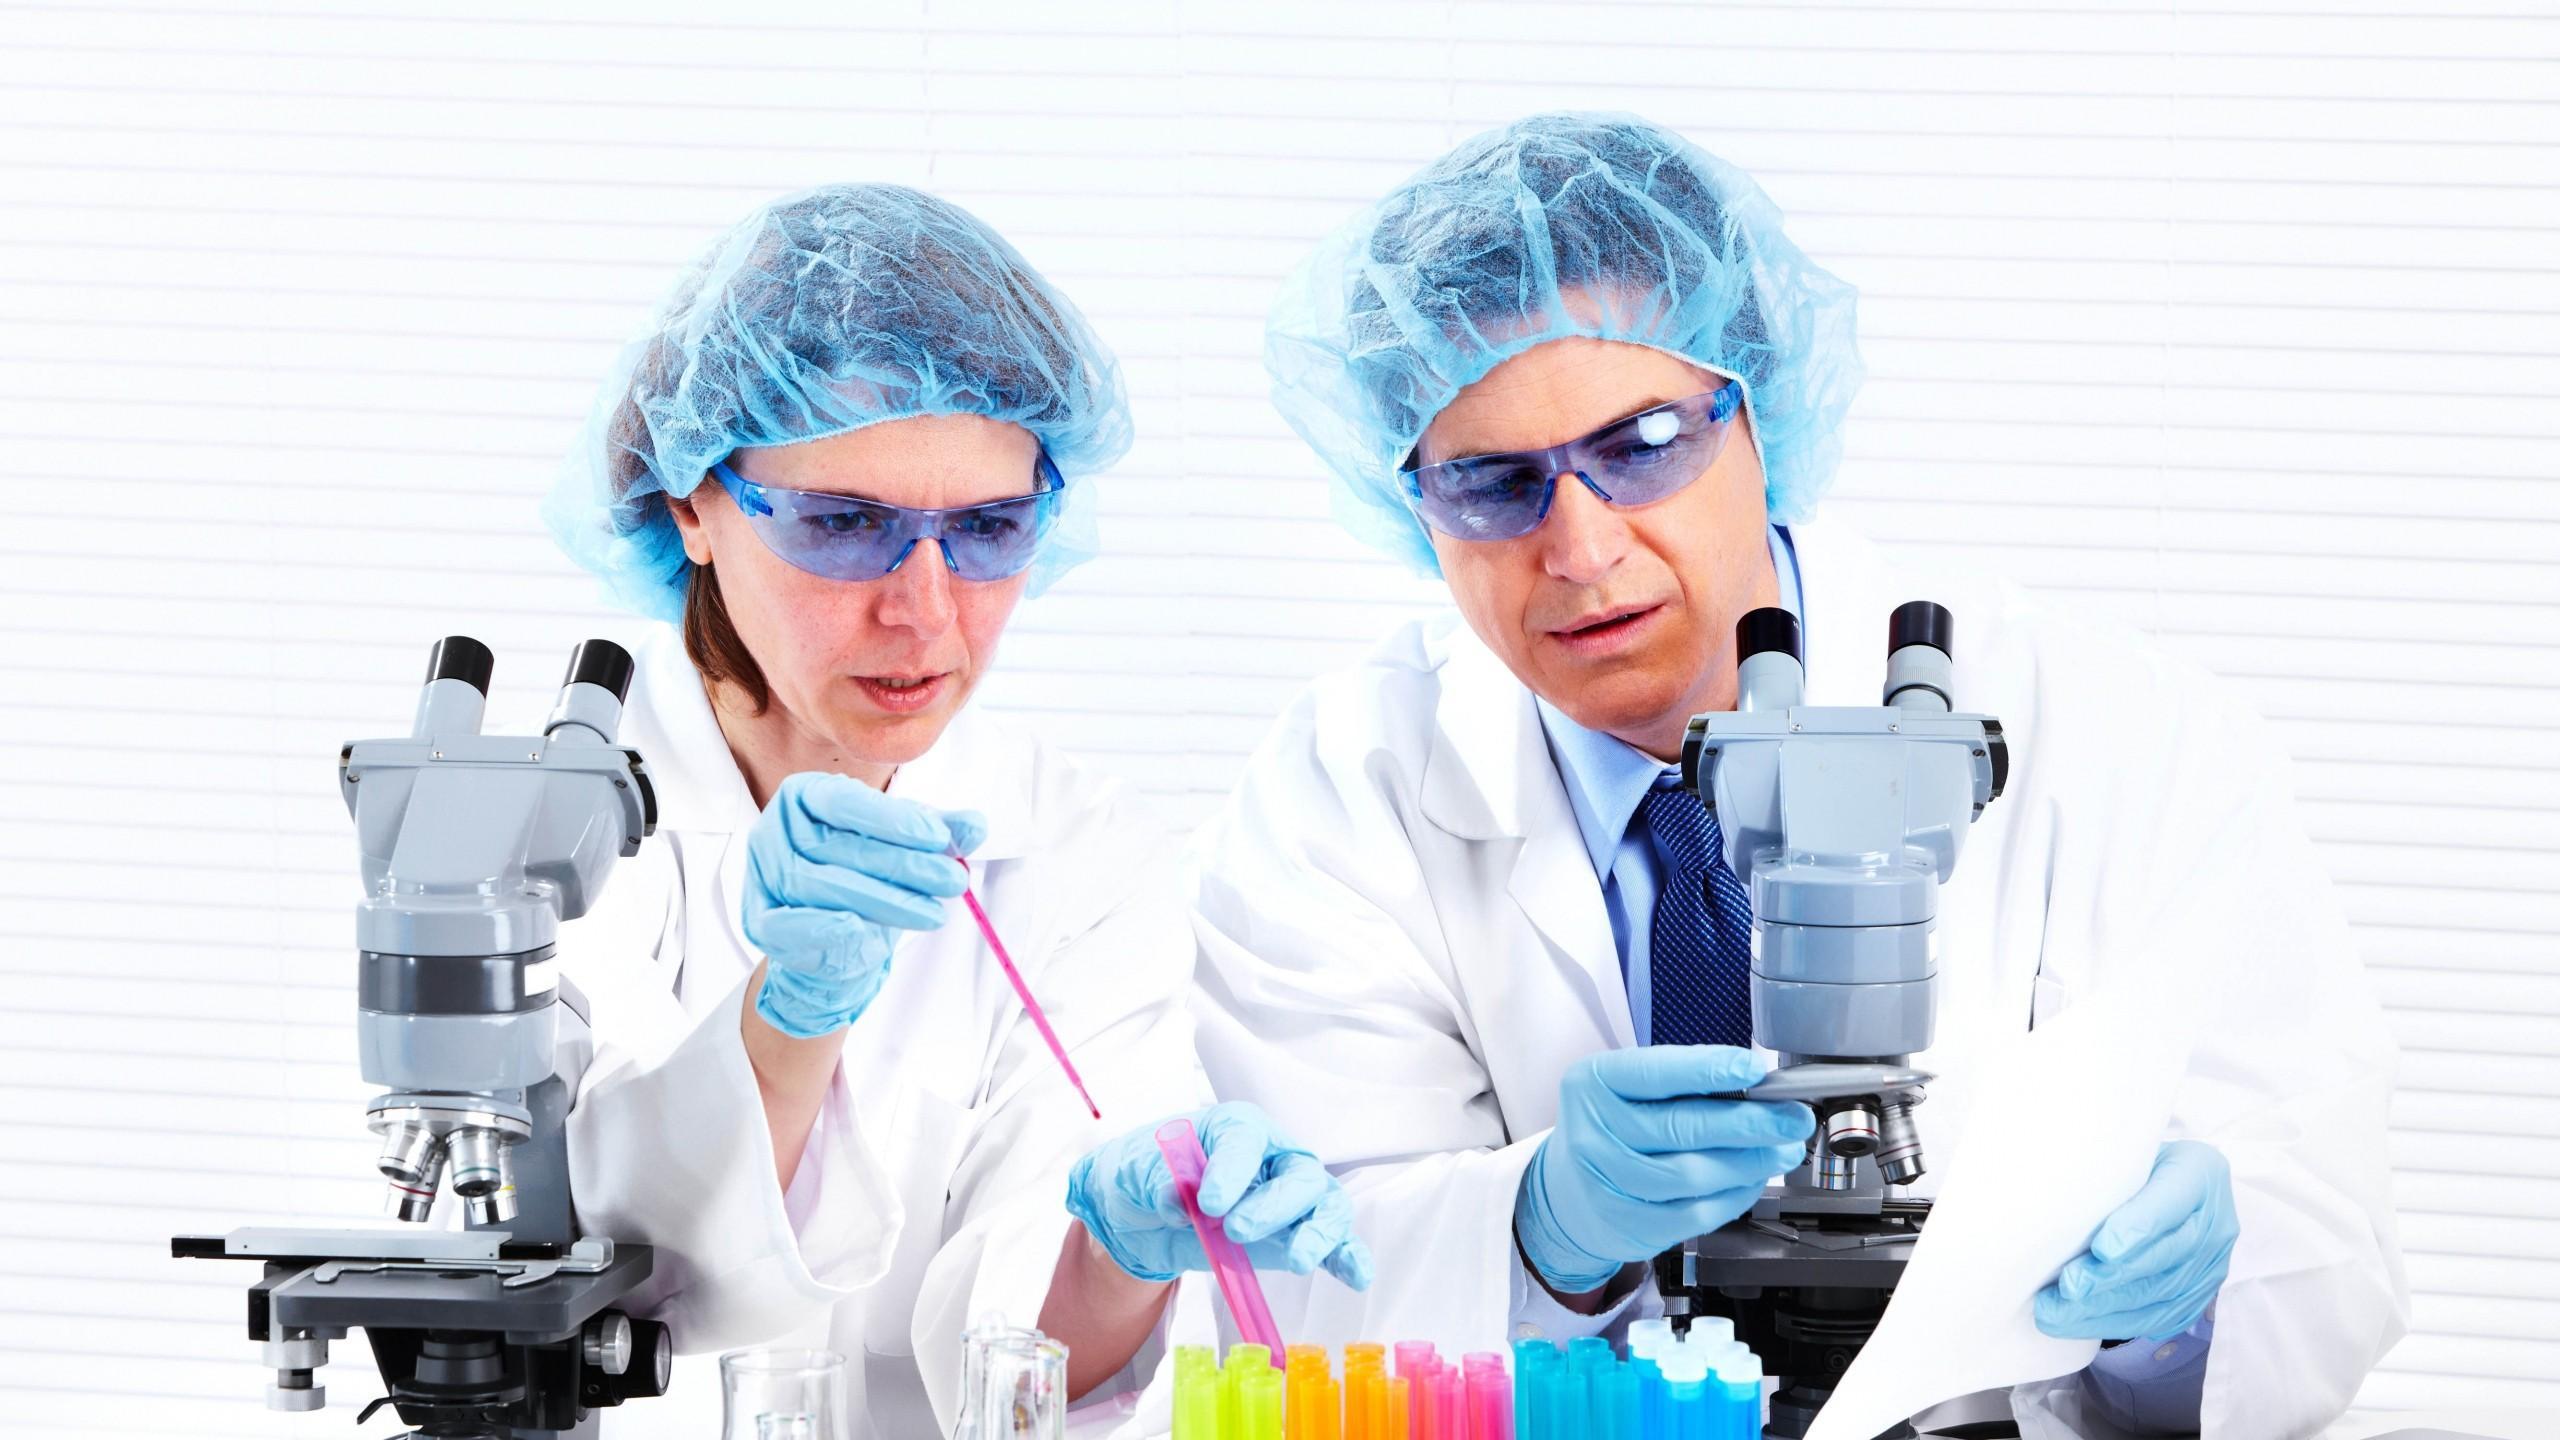 учёные